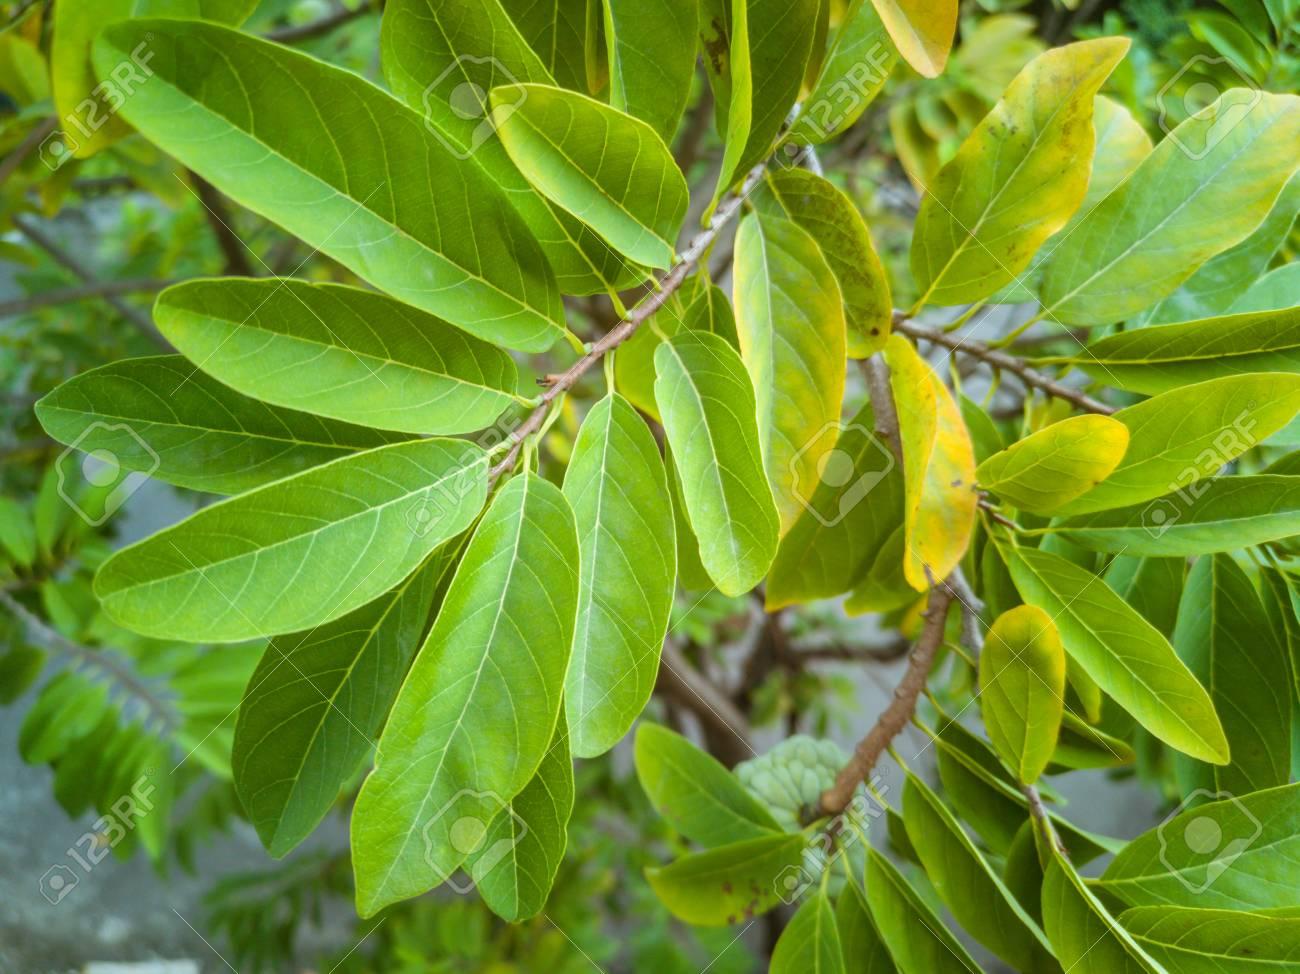 Green fresh natural leaves background in garden - 106223066